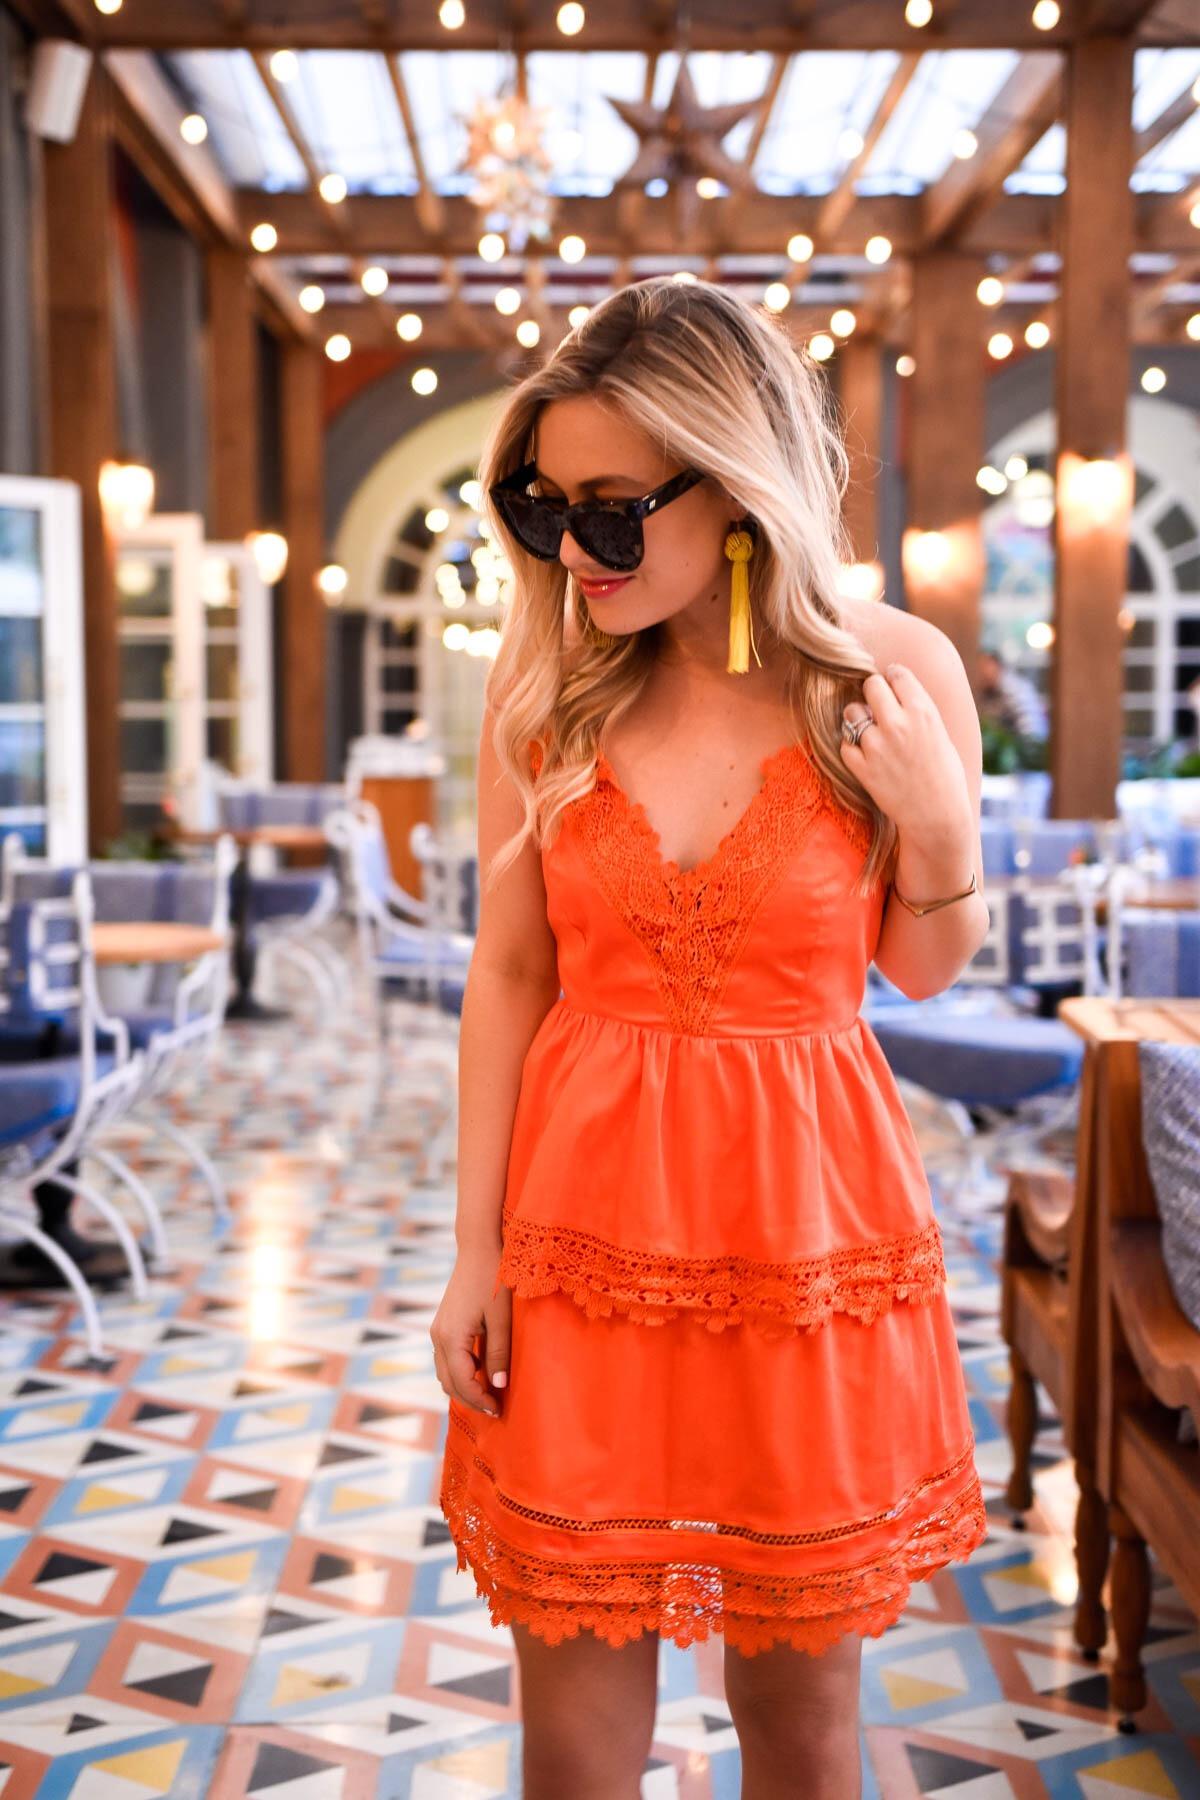 Bardot-Dress, Nordstrom-Dress, Lace-Dress, Orange-Lace-Dress, Bardot, Mexico-City, Travel-Blogger